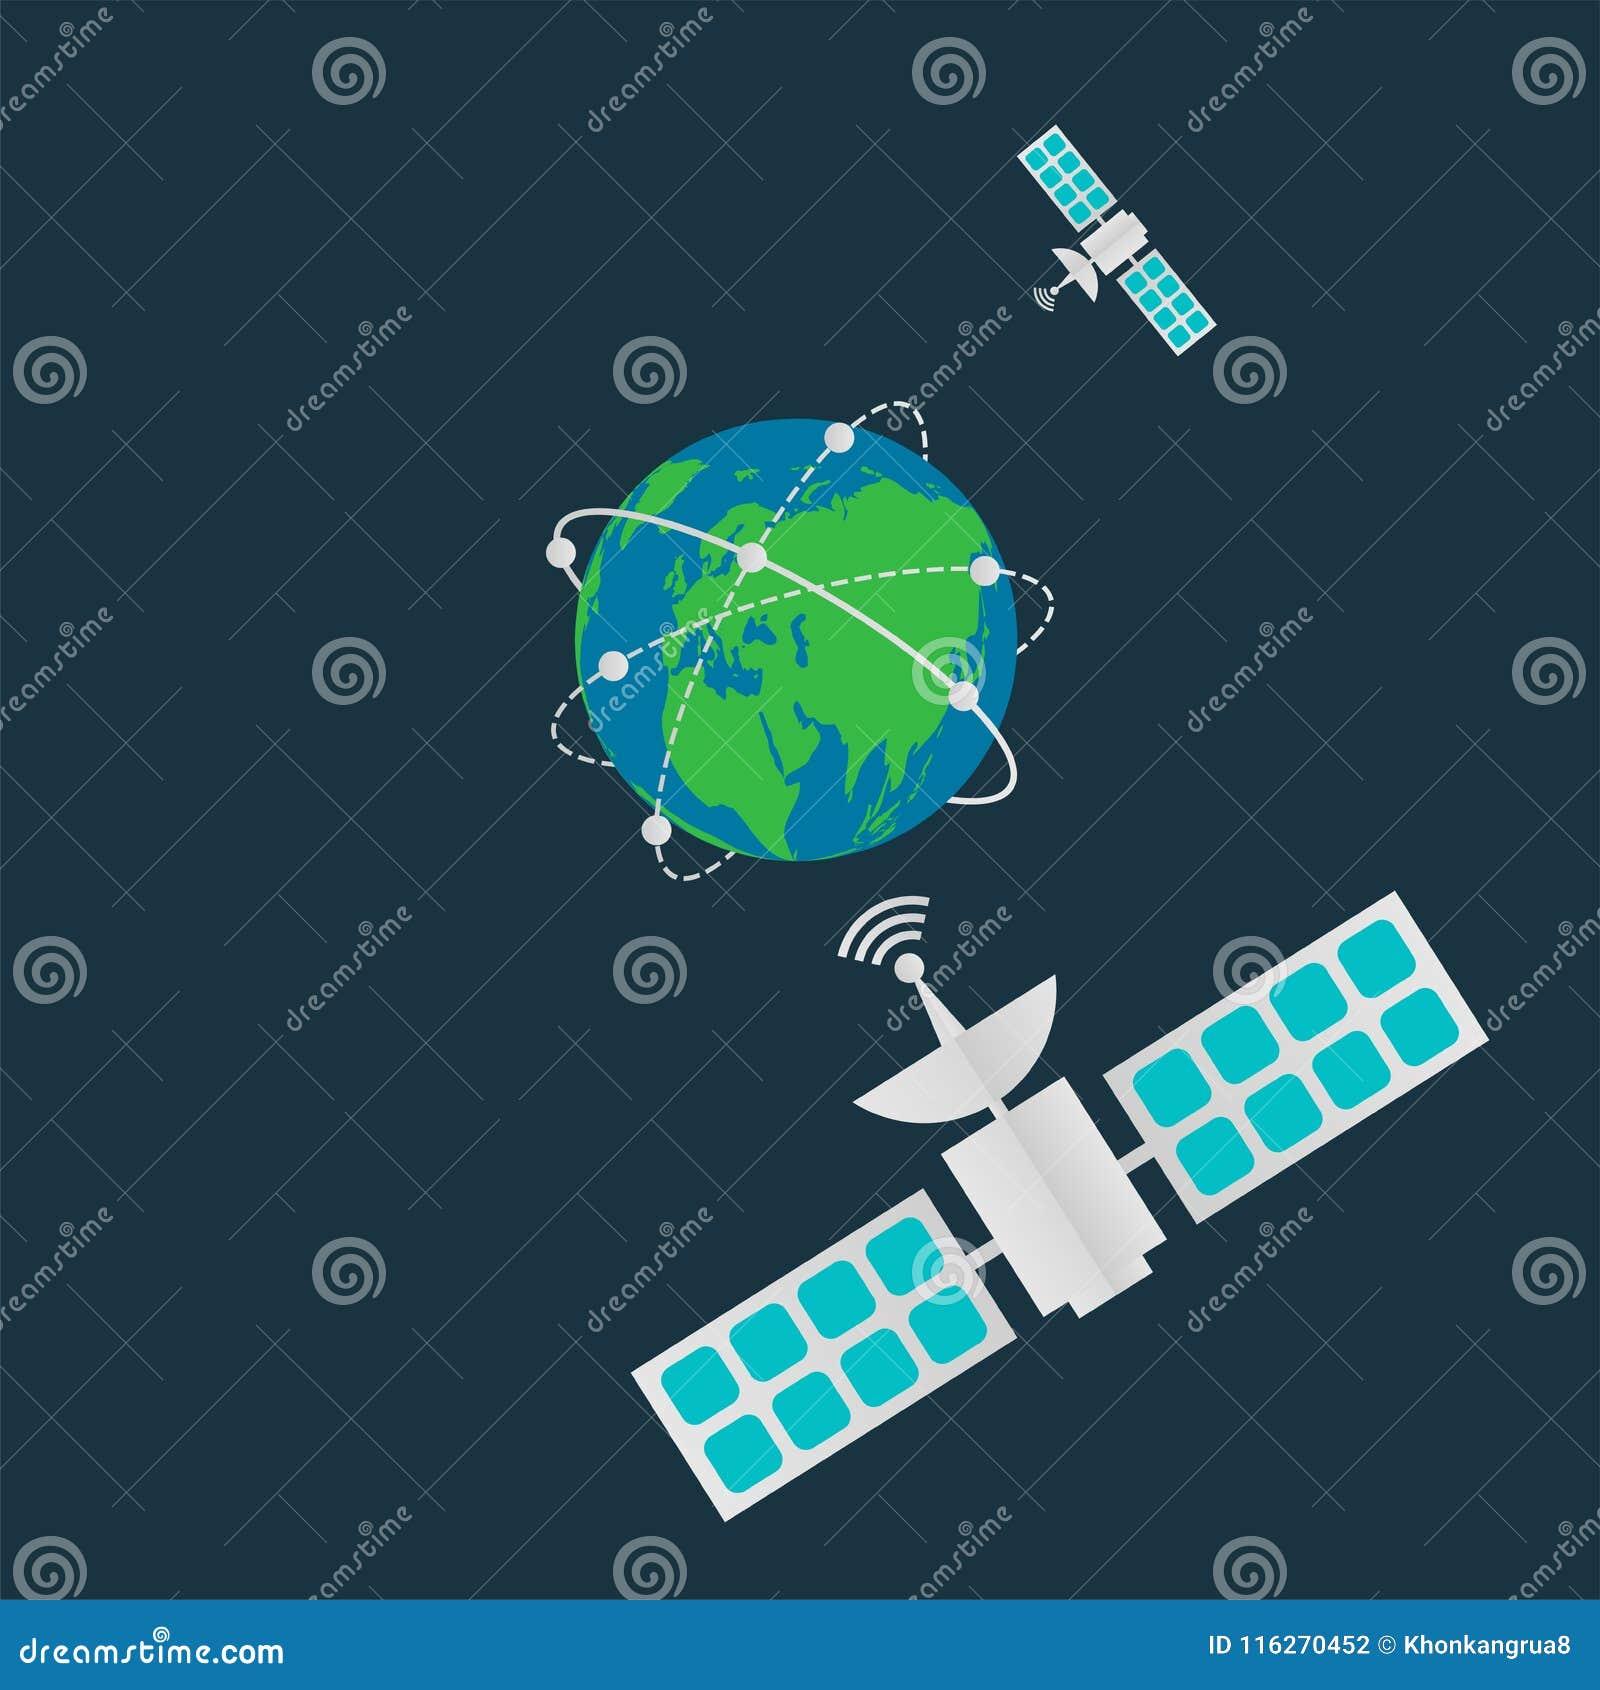 Communication Satellite Obeting Diagram Trusted Schematics Schematic Wiring Whirlpool M Ed22ekxp Satellites In Orbit Earthdigital Terrestrial